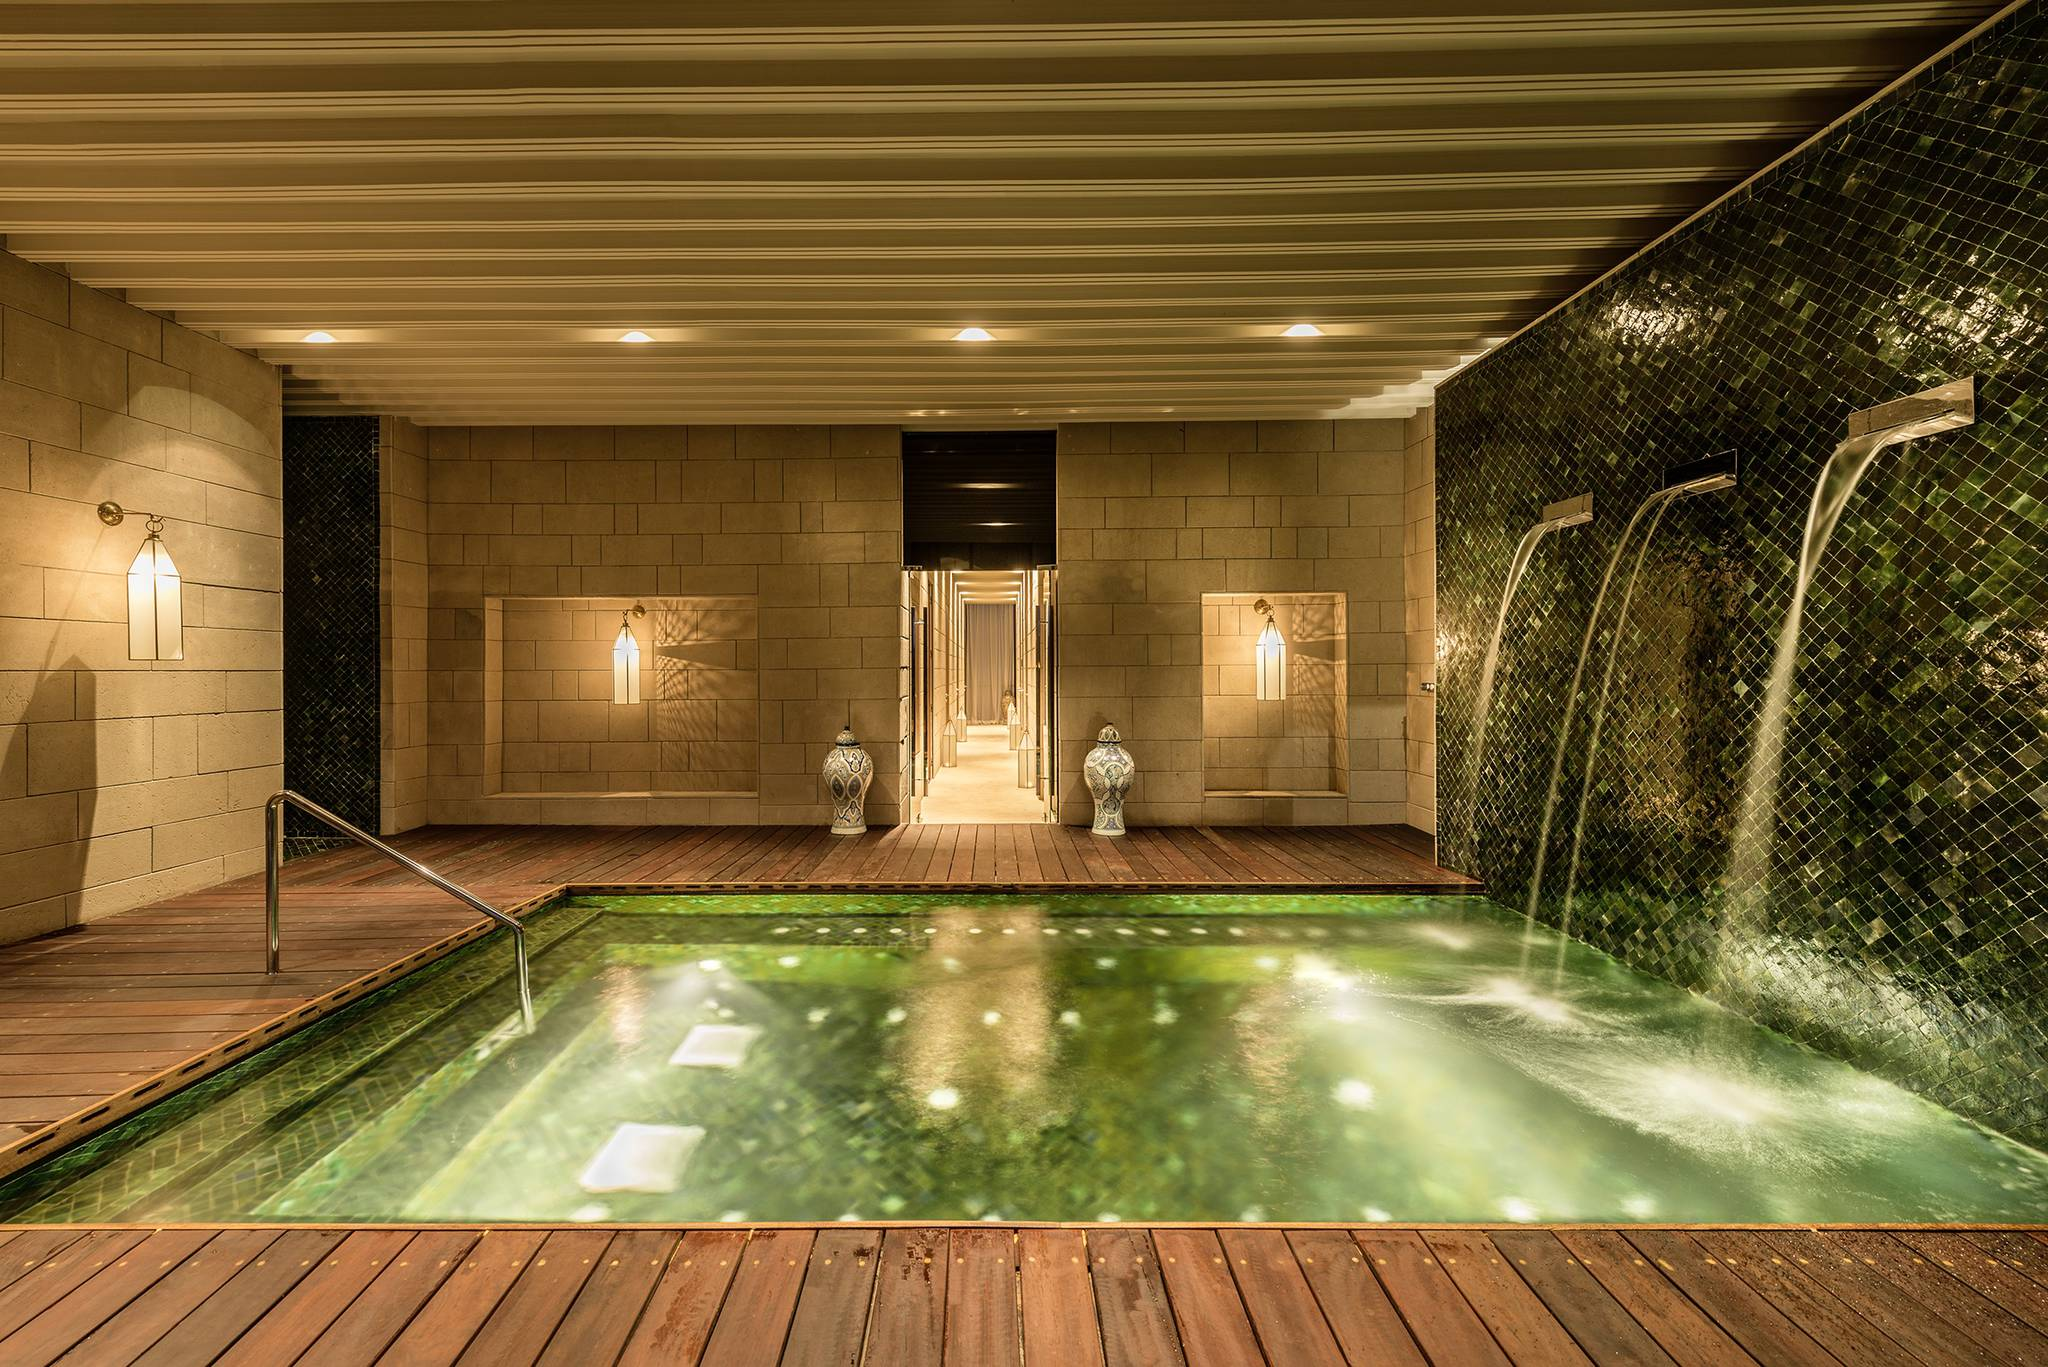 Hotel-Sahrai-Spa-Givenchy-2048x1367.jpg